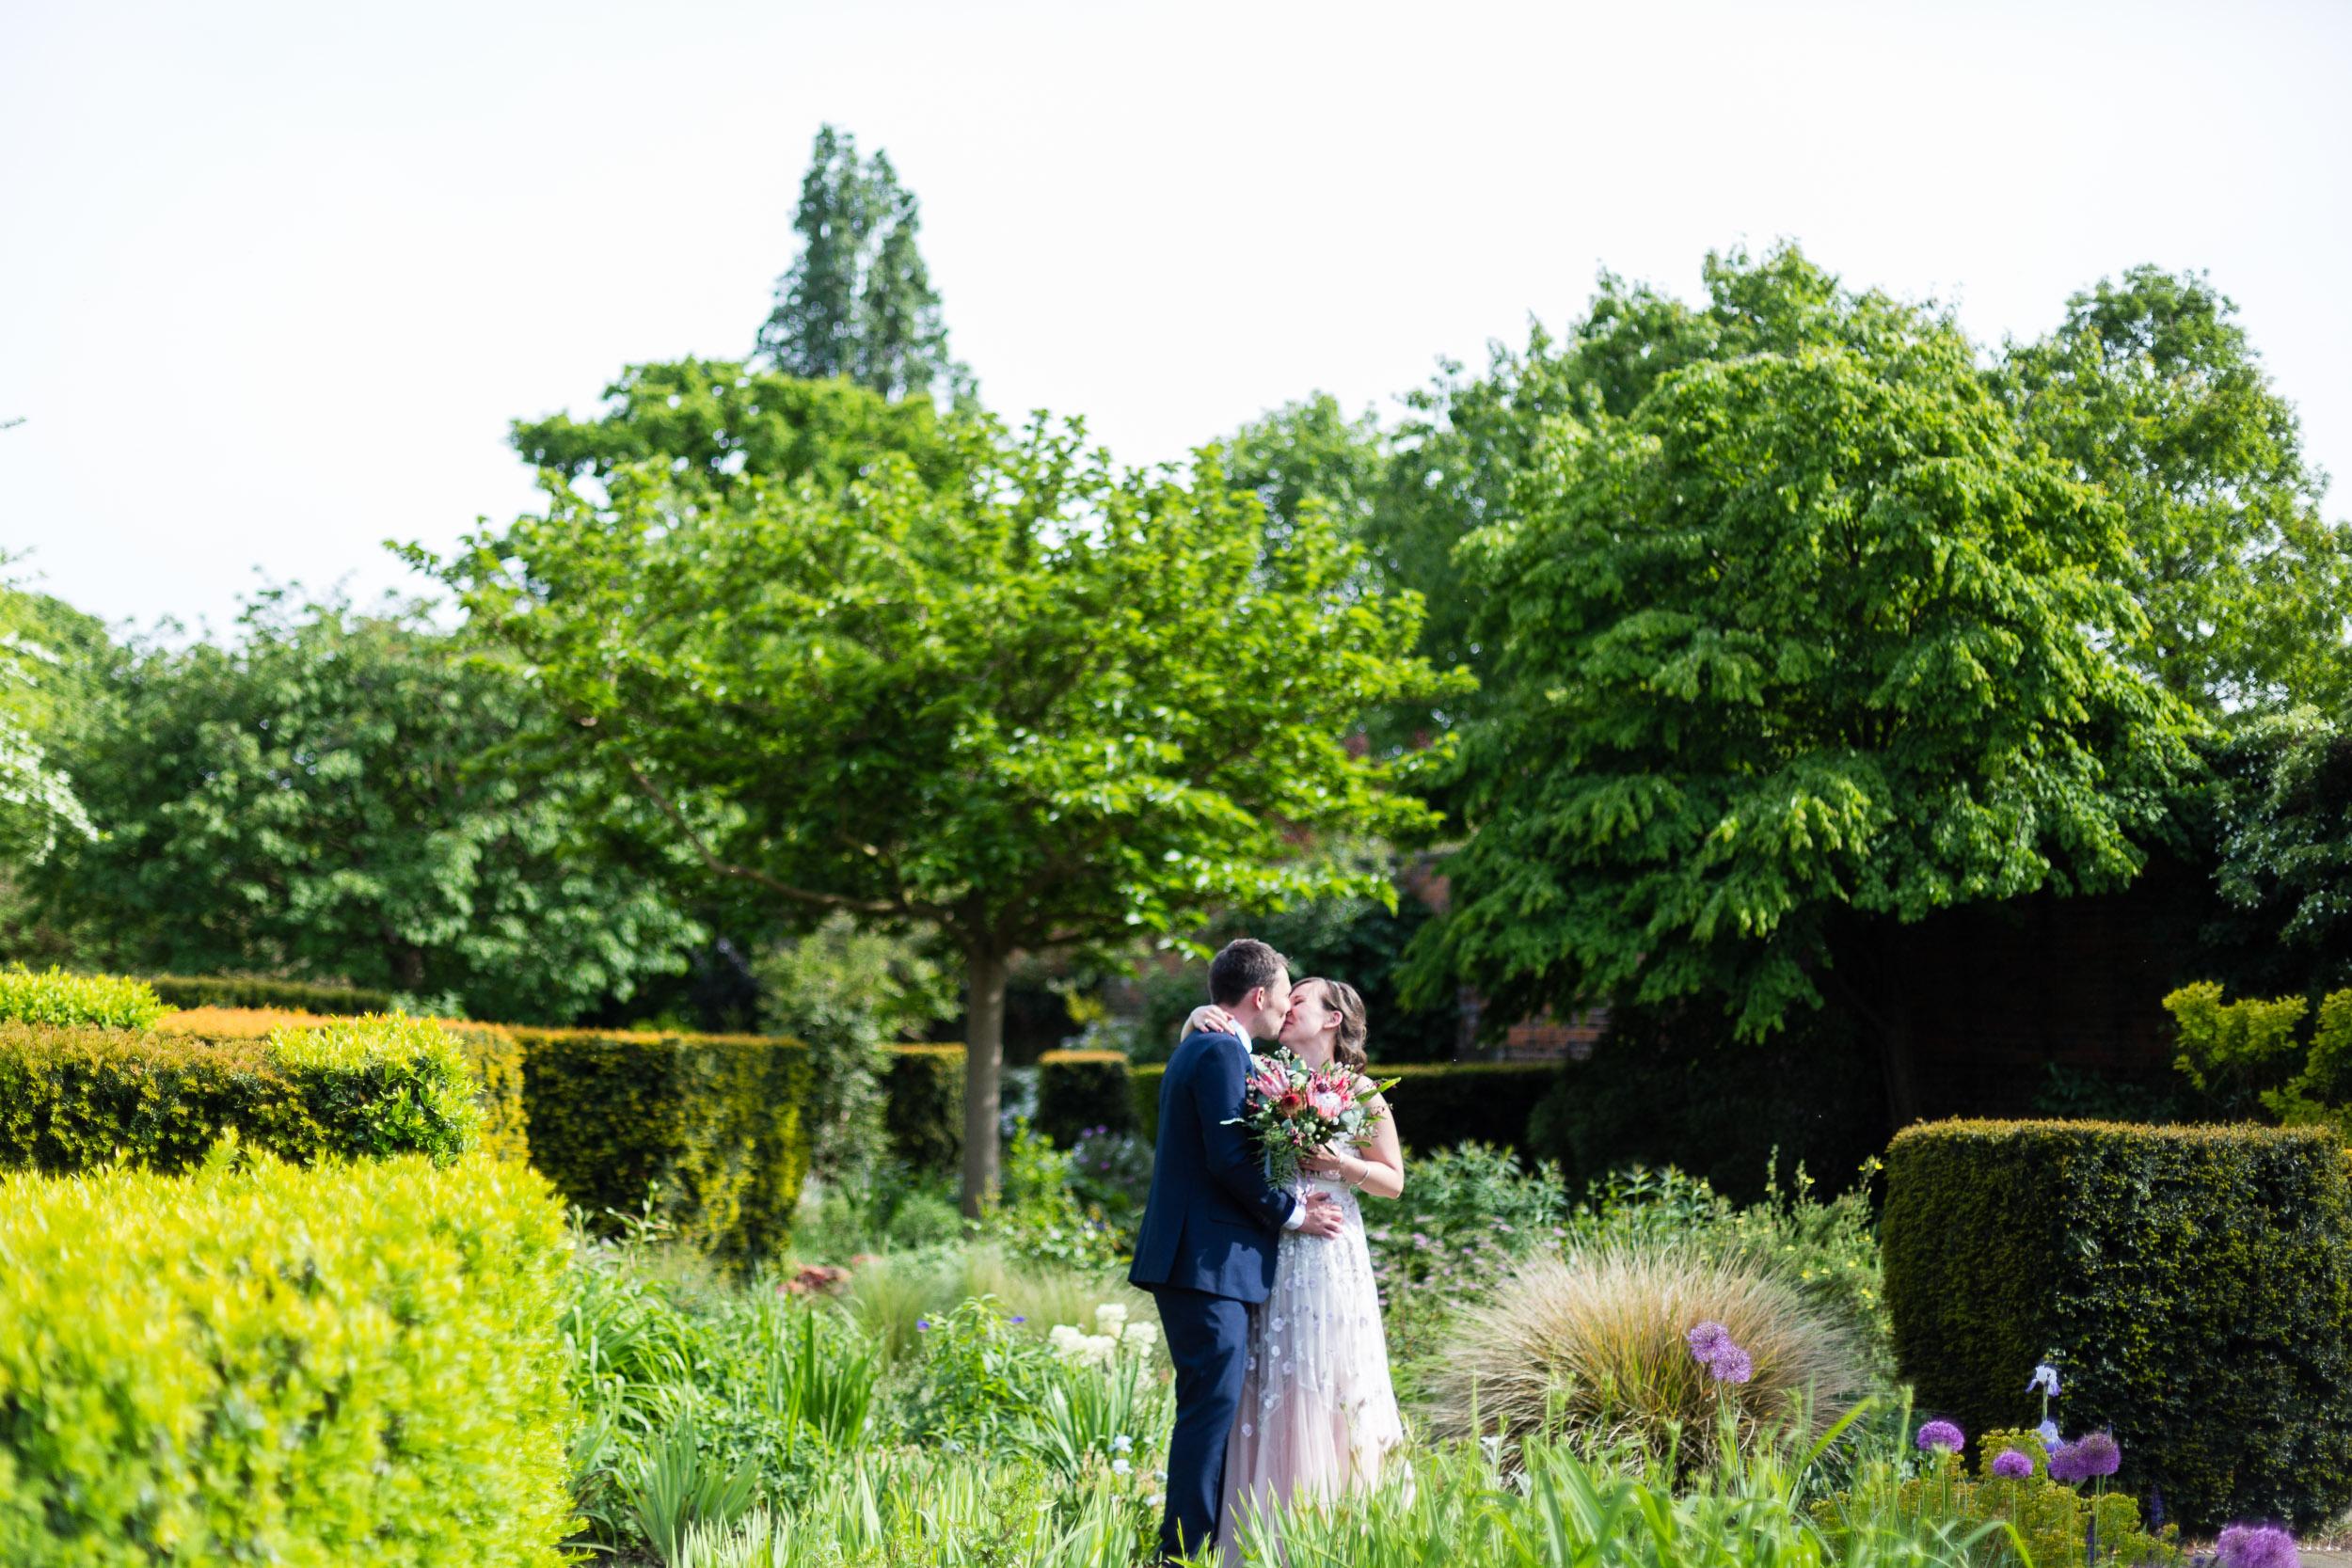 brockwell-lido-brixton-herne-hill-wedding-278.jpg